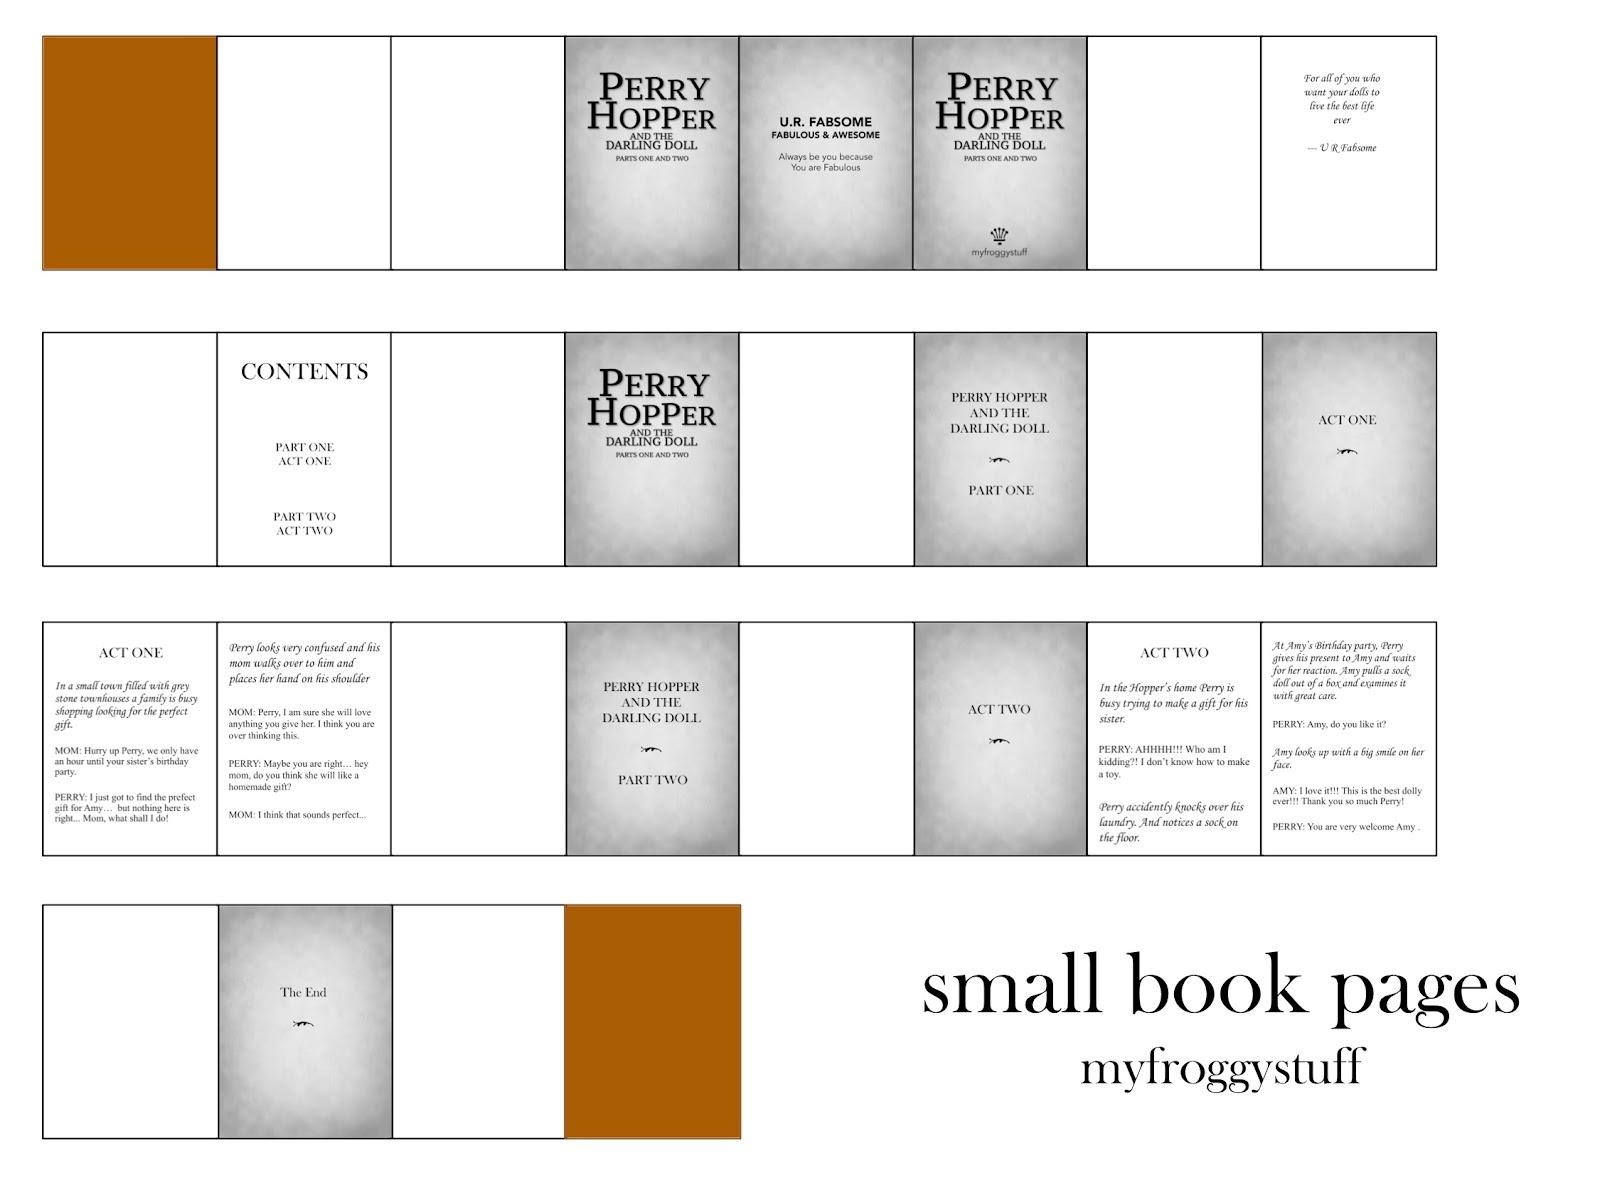 Myfroggystuff Blogspot Free Printables